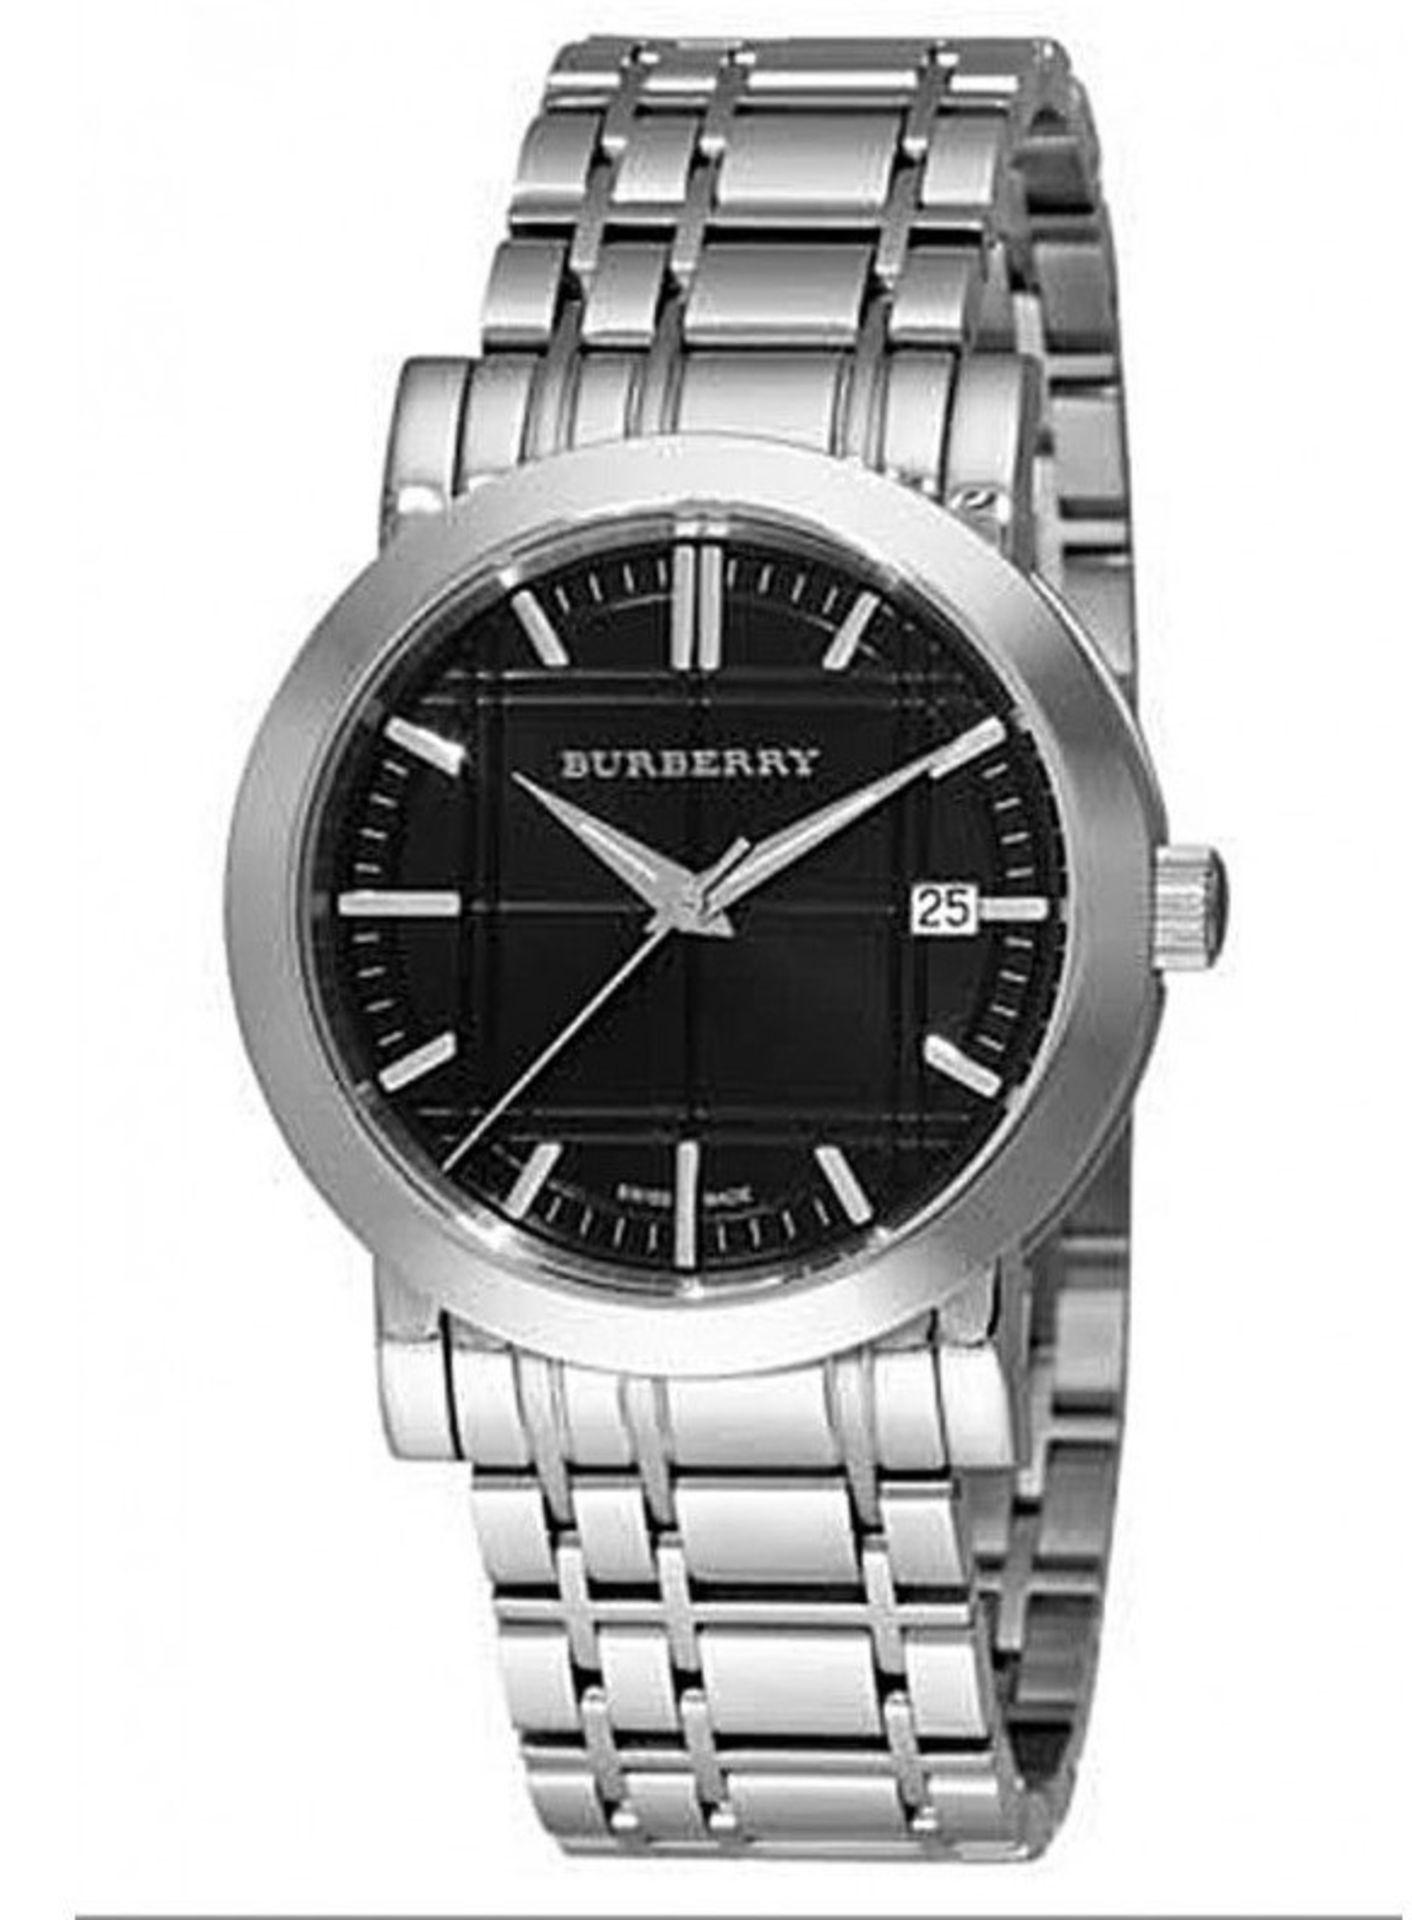 Burberry BU1365 Ladies Watch - Image 2 of 2